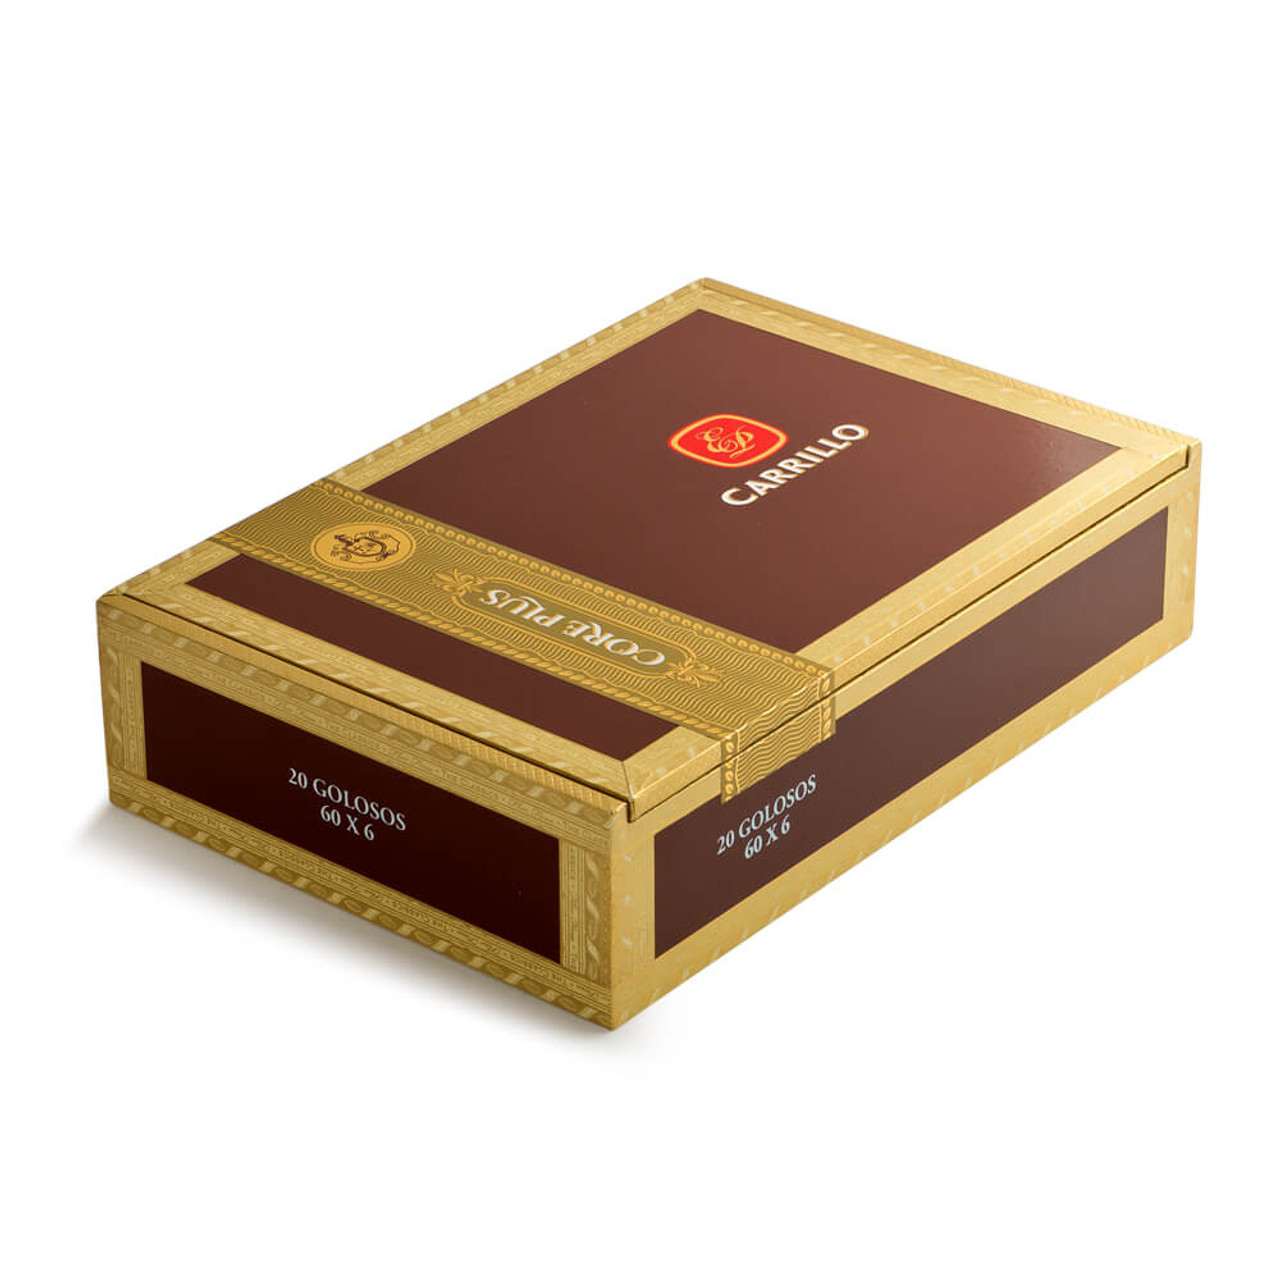 E.P. Carrillo Core Plus Golosos Cigars - 6 x 60 (Box of 20)